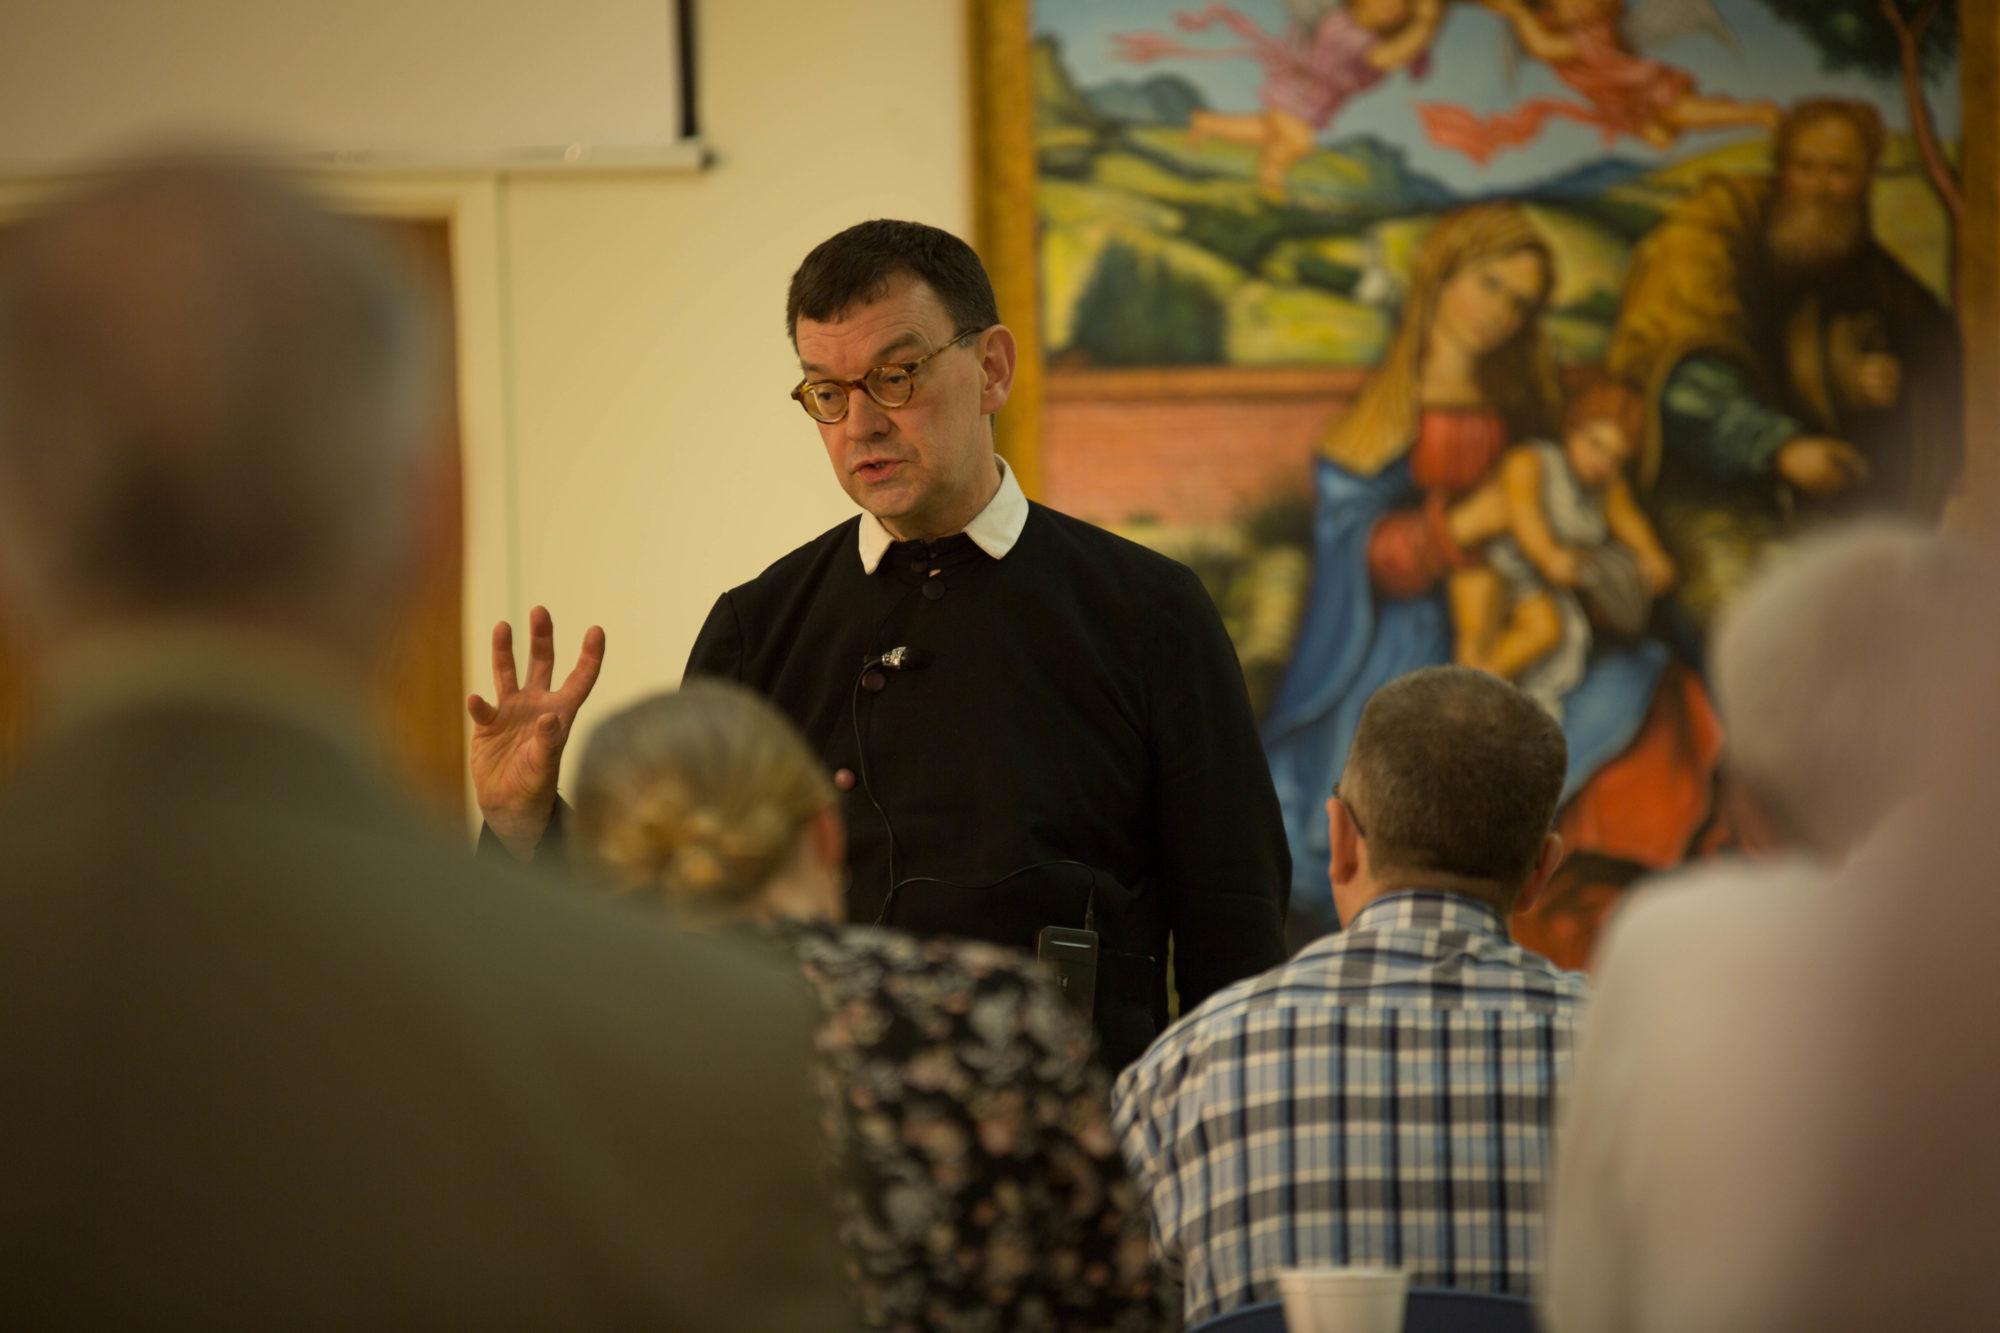 Fr Derek teaches at Summer School